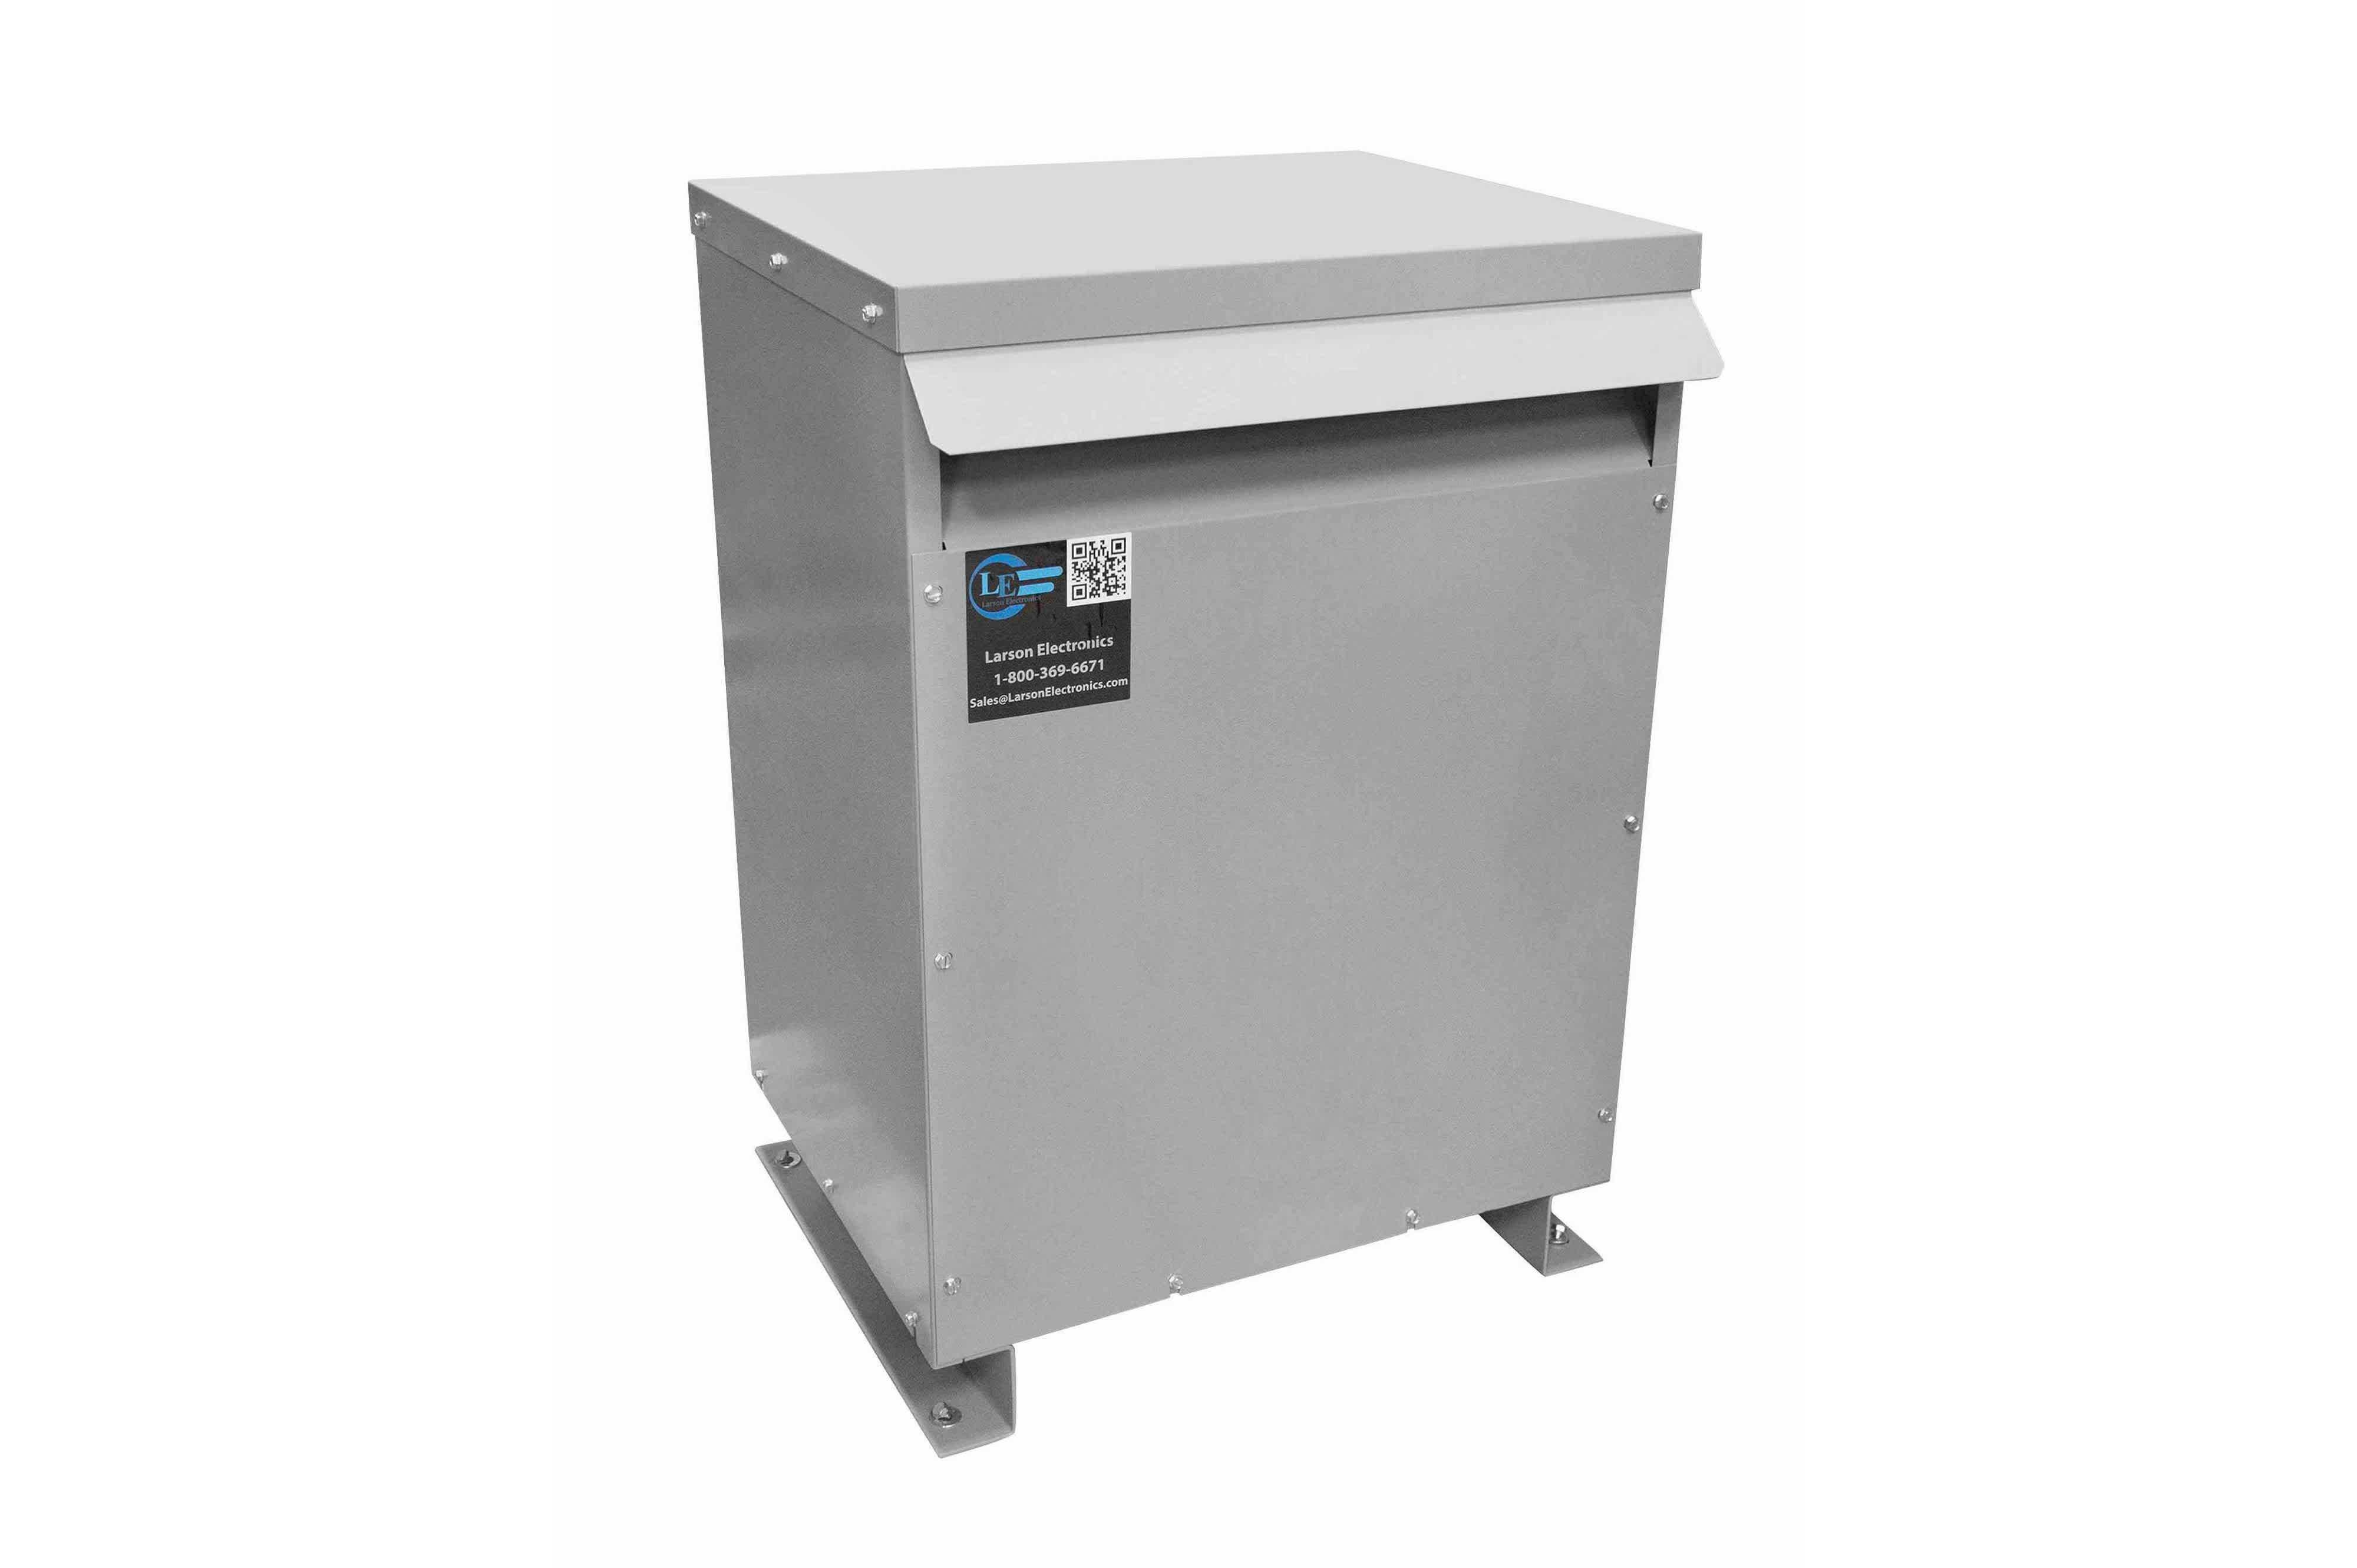 237.5 kVA 3PH Isolation Transformer, 440V Wye Primary, 240V Delta Secondary, N3R, Ventilated, 60 Hz